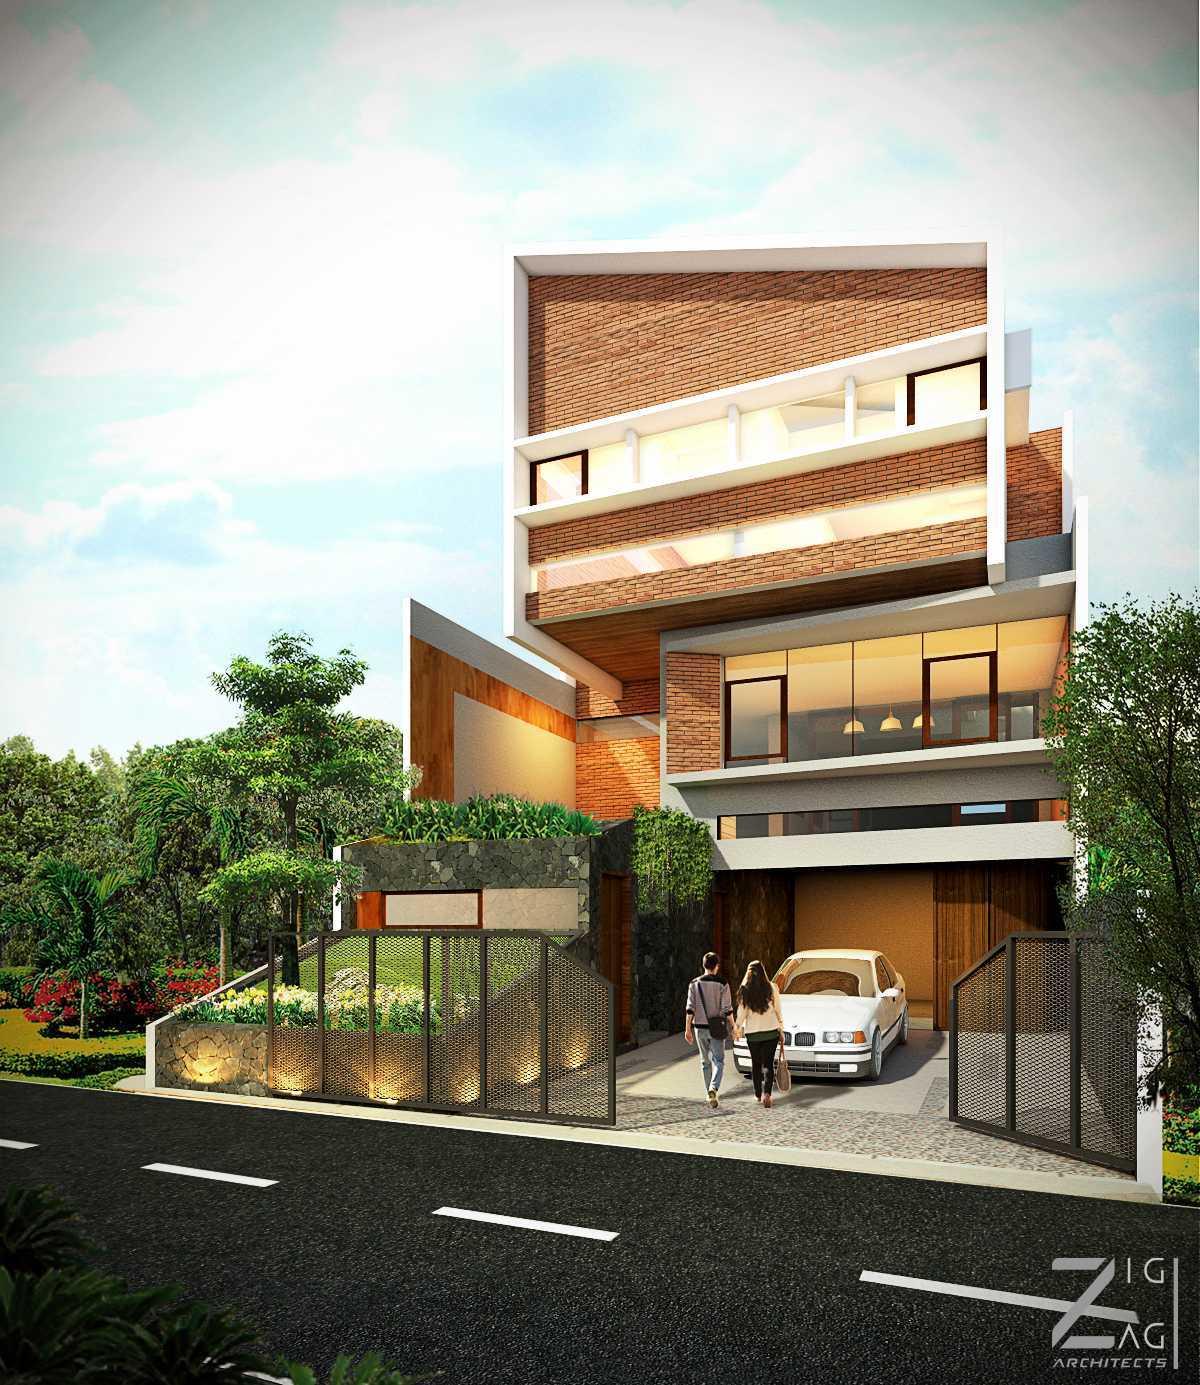 Zigzag Architecture Studio F House Kemang - Pedurenan Daerah Khusus Ibukota Jakarta, Indonesia Daerah Khusus Ibukota Jakarta, Indonesia Ampera-Copy  37002